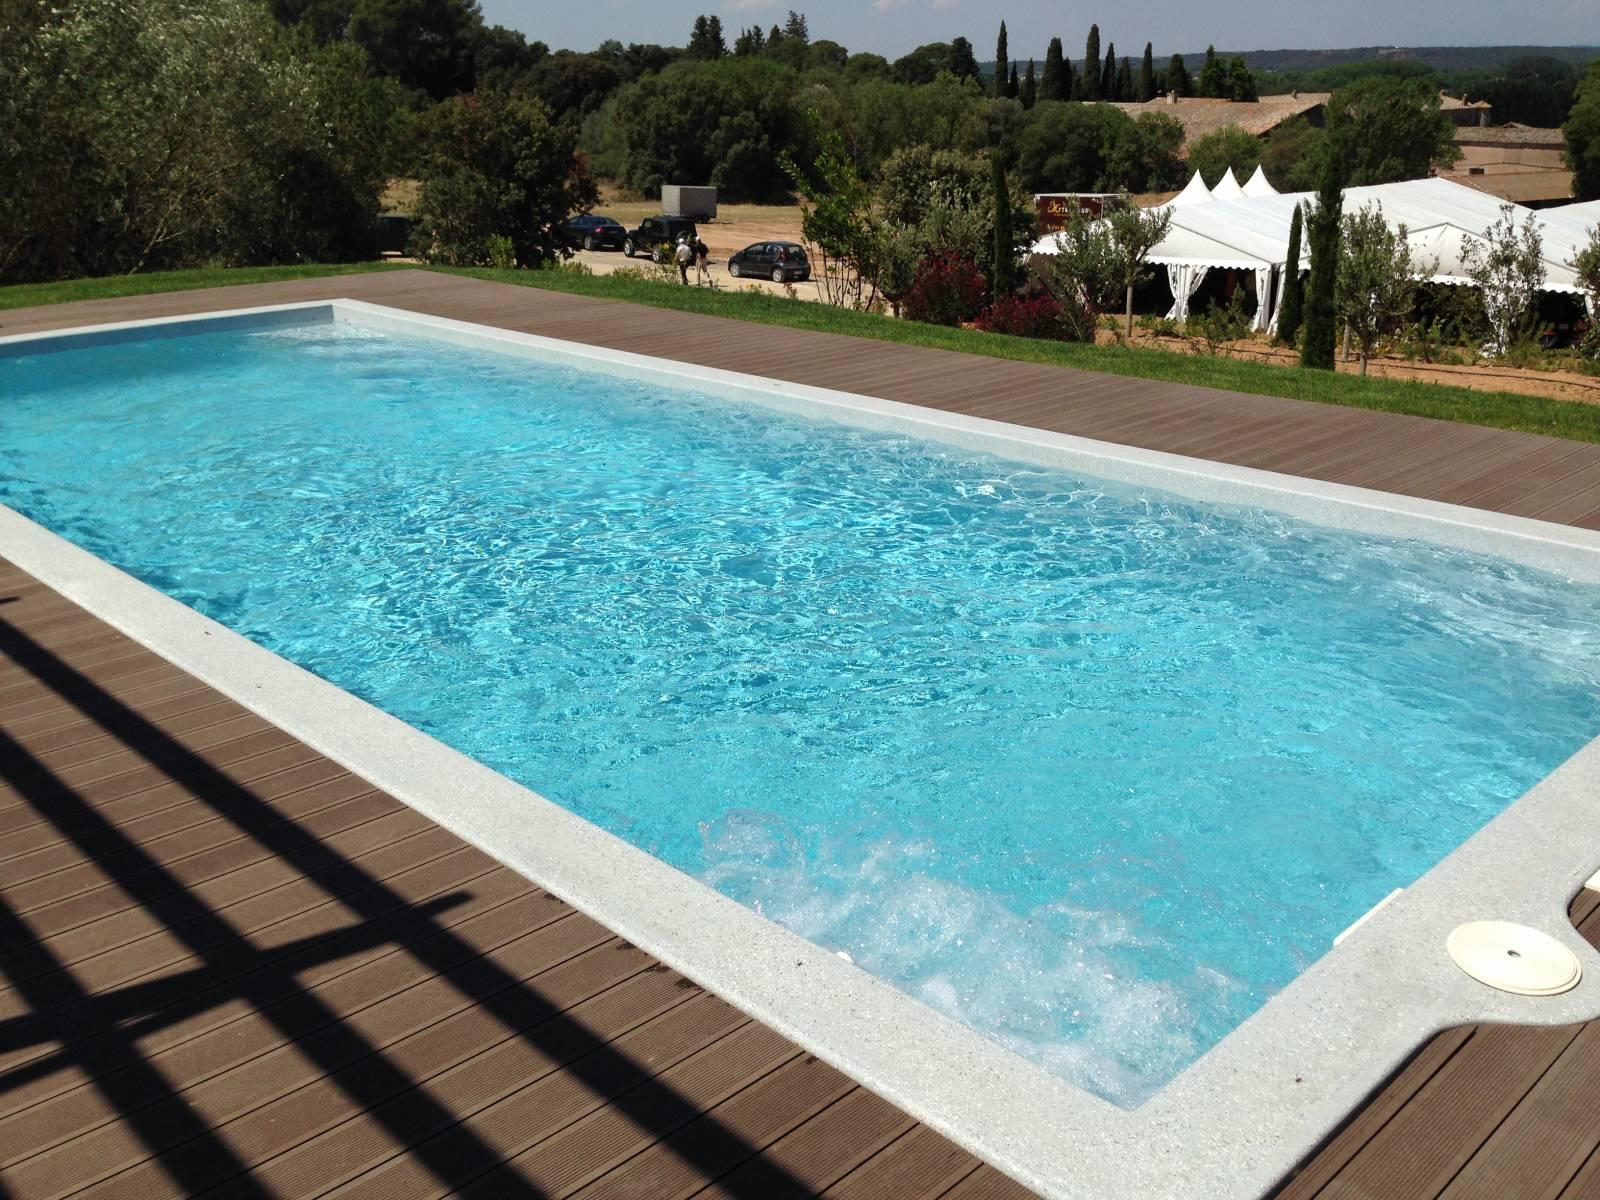 Piscine coque polyester freedom gamme platinium for Accessoire piscine 62